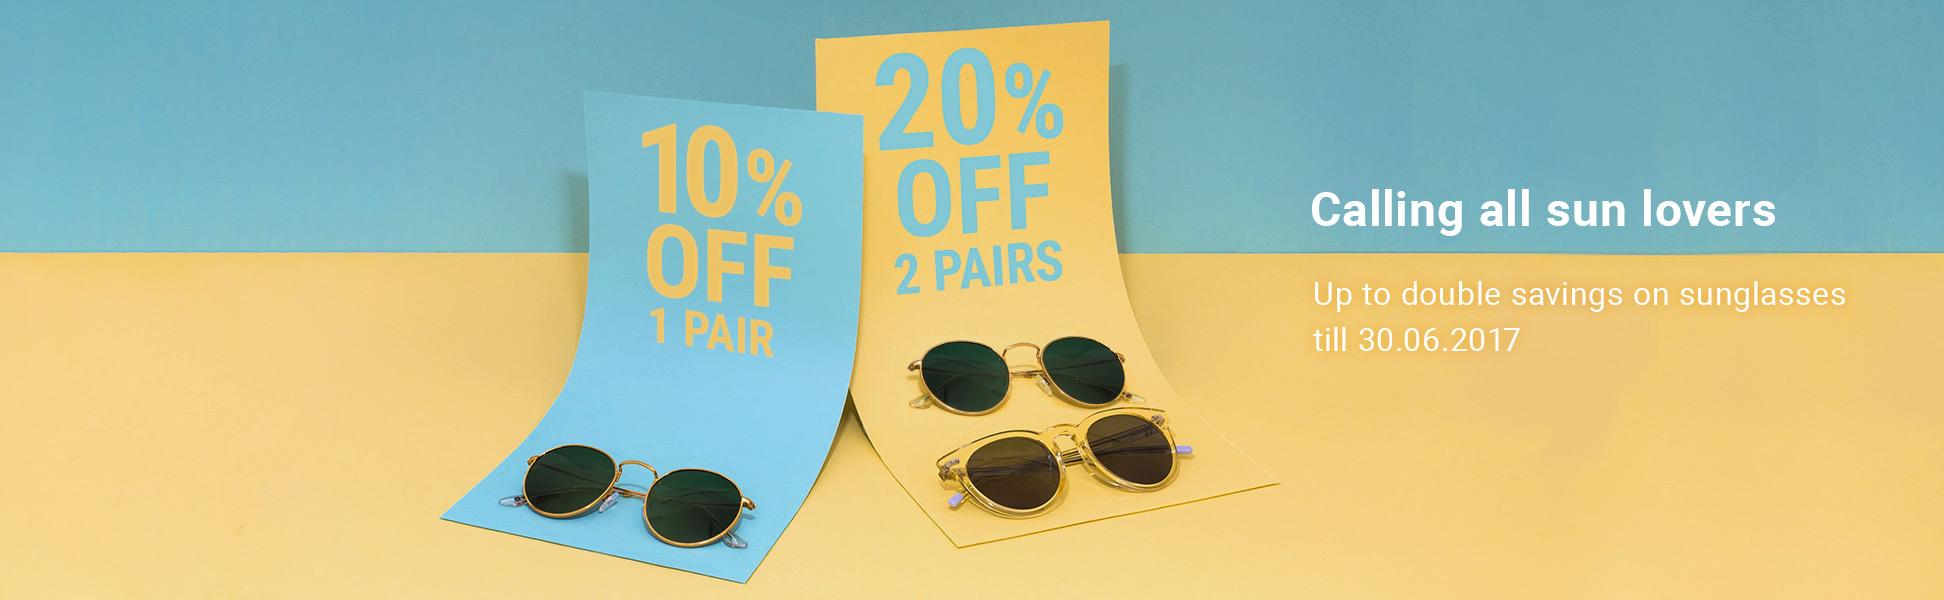 Misterspex:  10% off 1 pair, 20% off 2 pairs off sunglasses